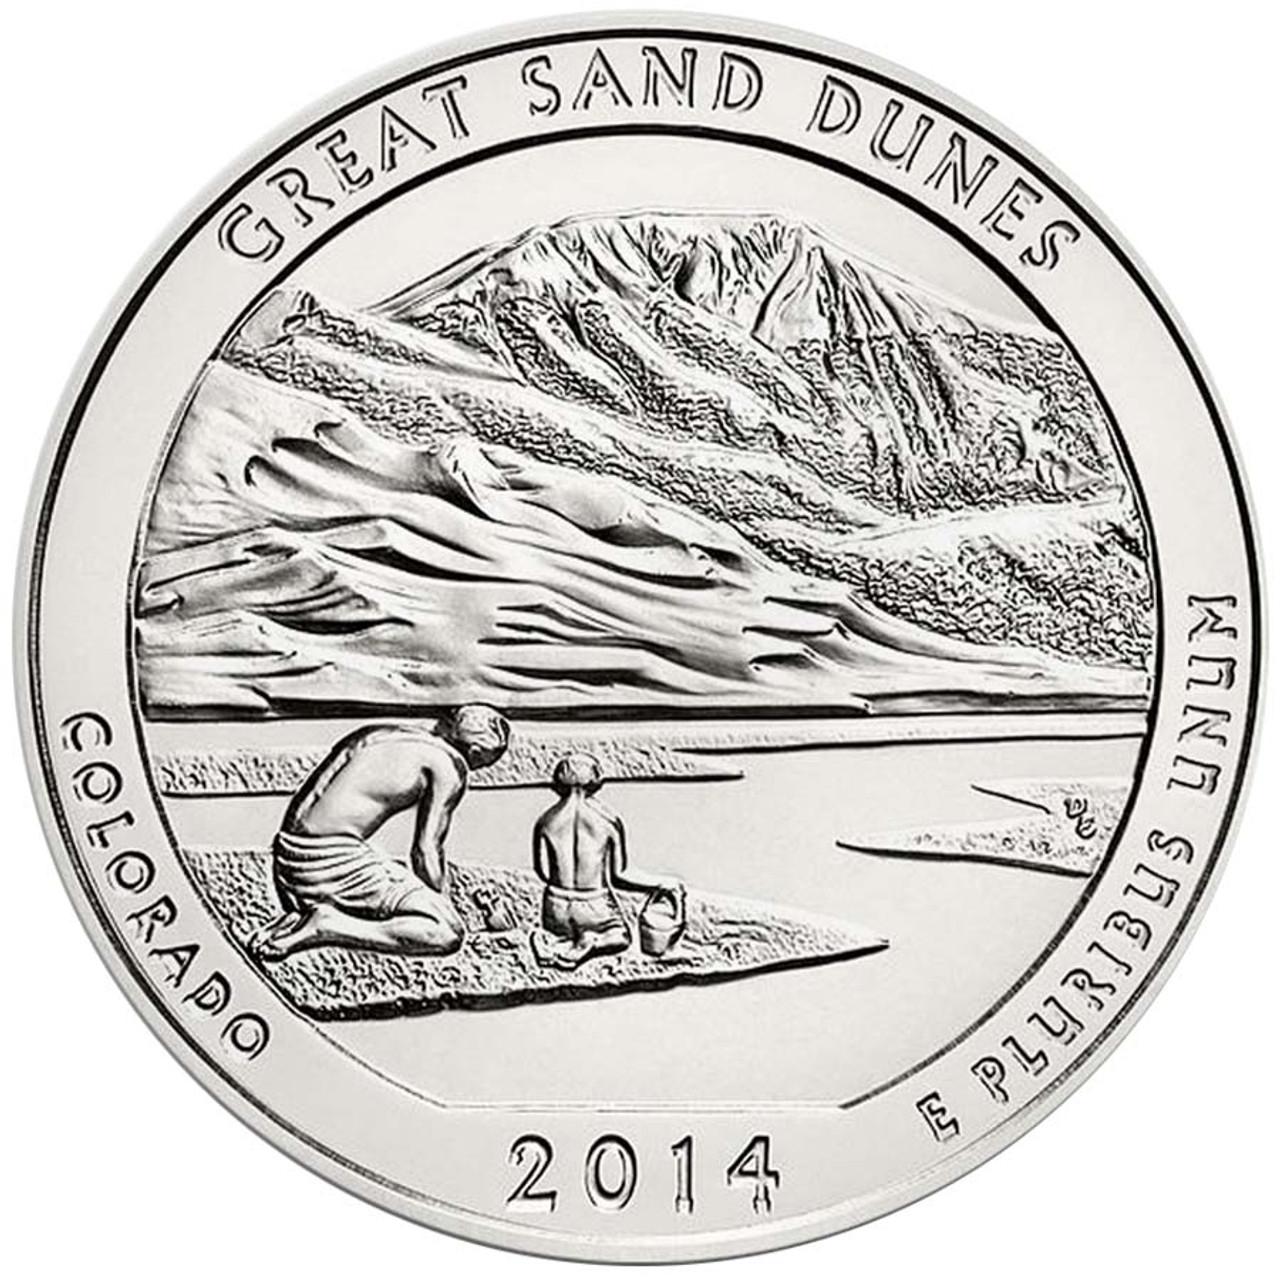 2014-P Great Sand Dunes National Park Quarter Brilliant Uncirculated Image 1